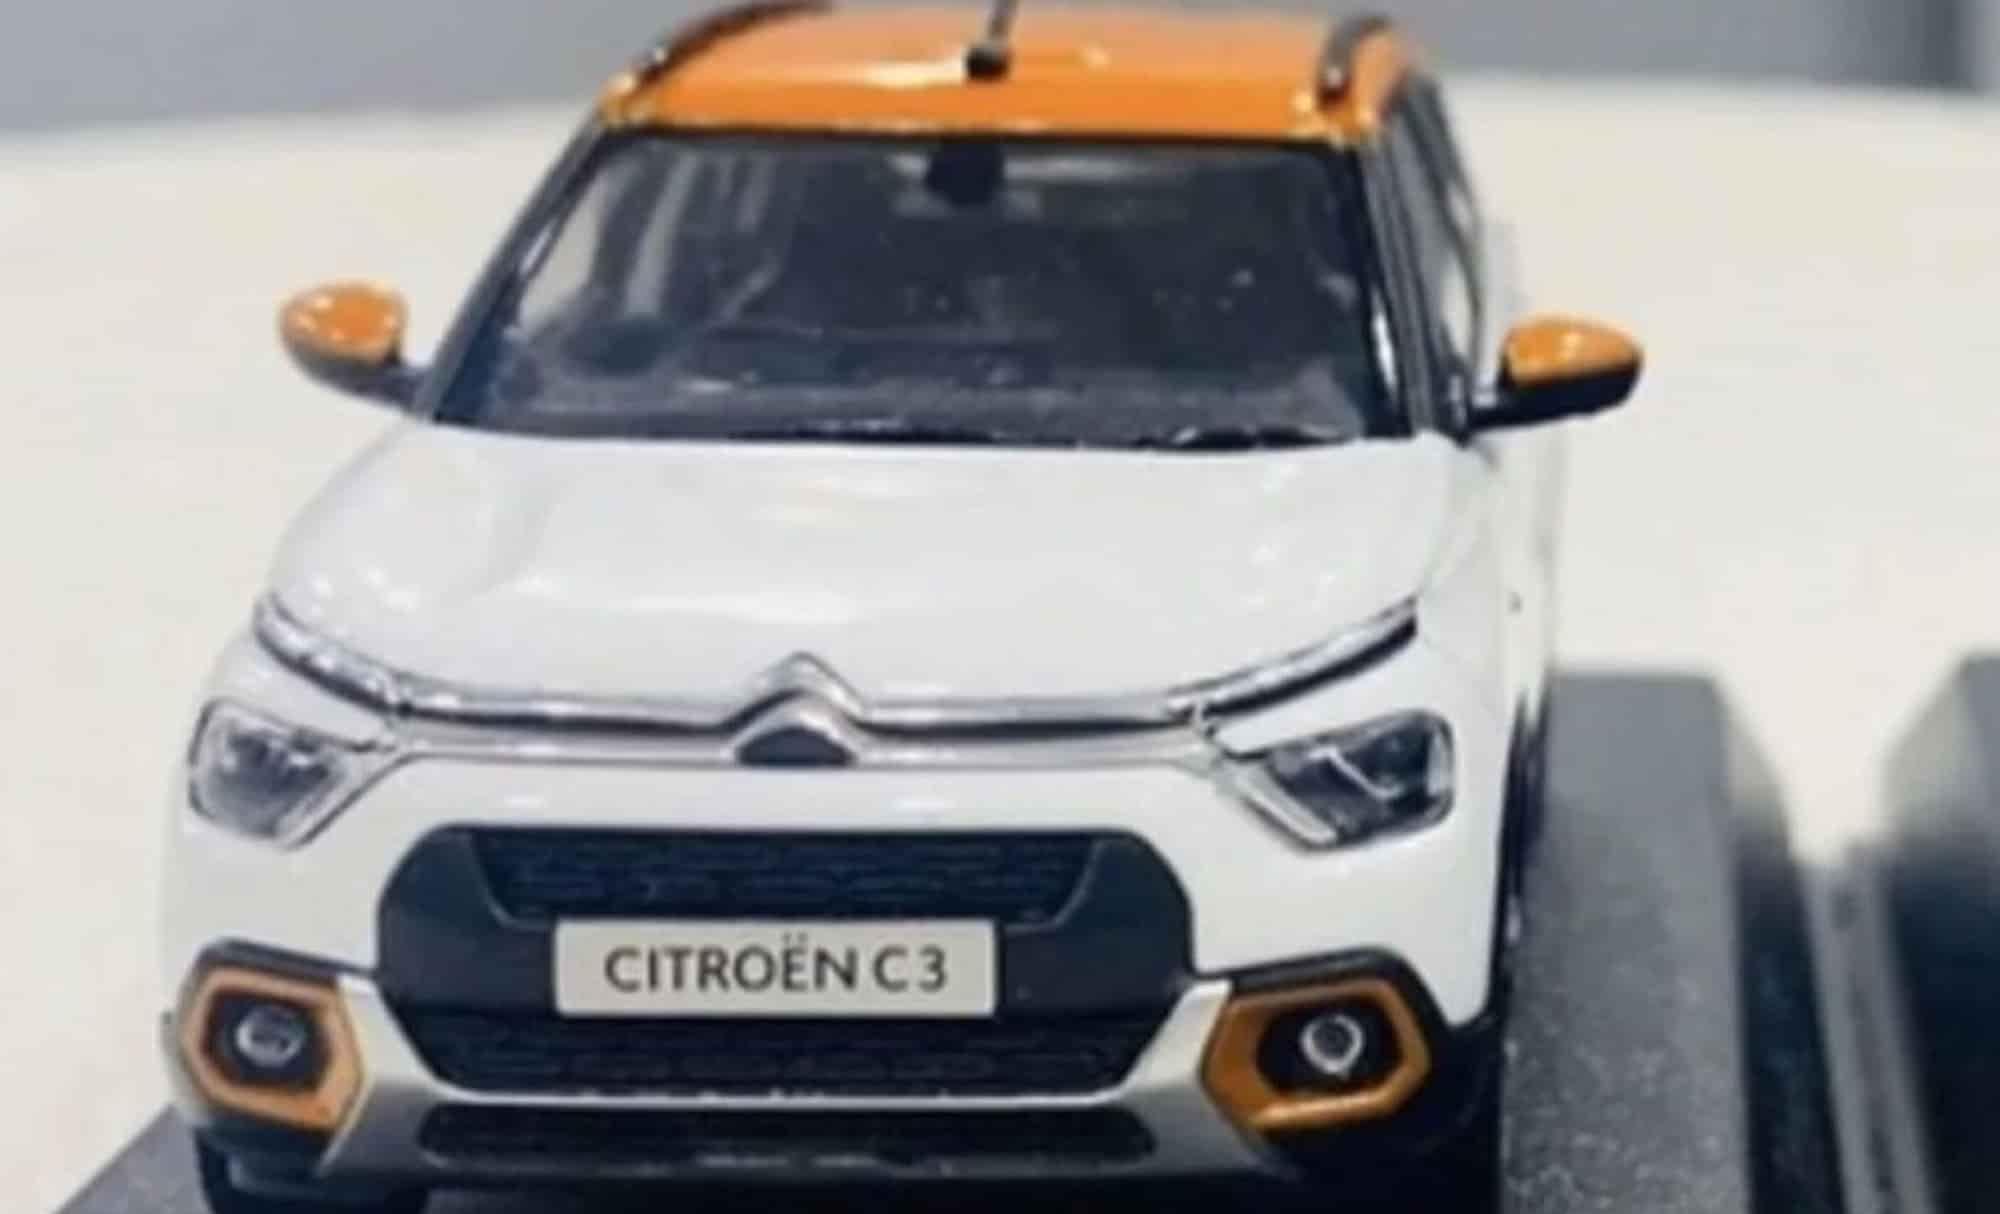 Citroen C3 Compact SUV 1